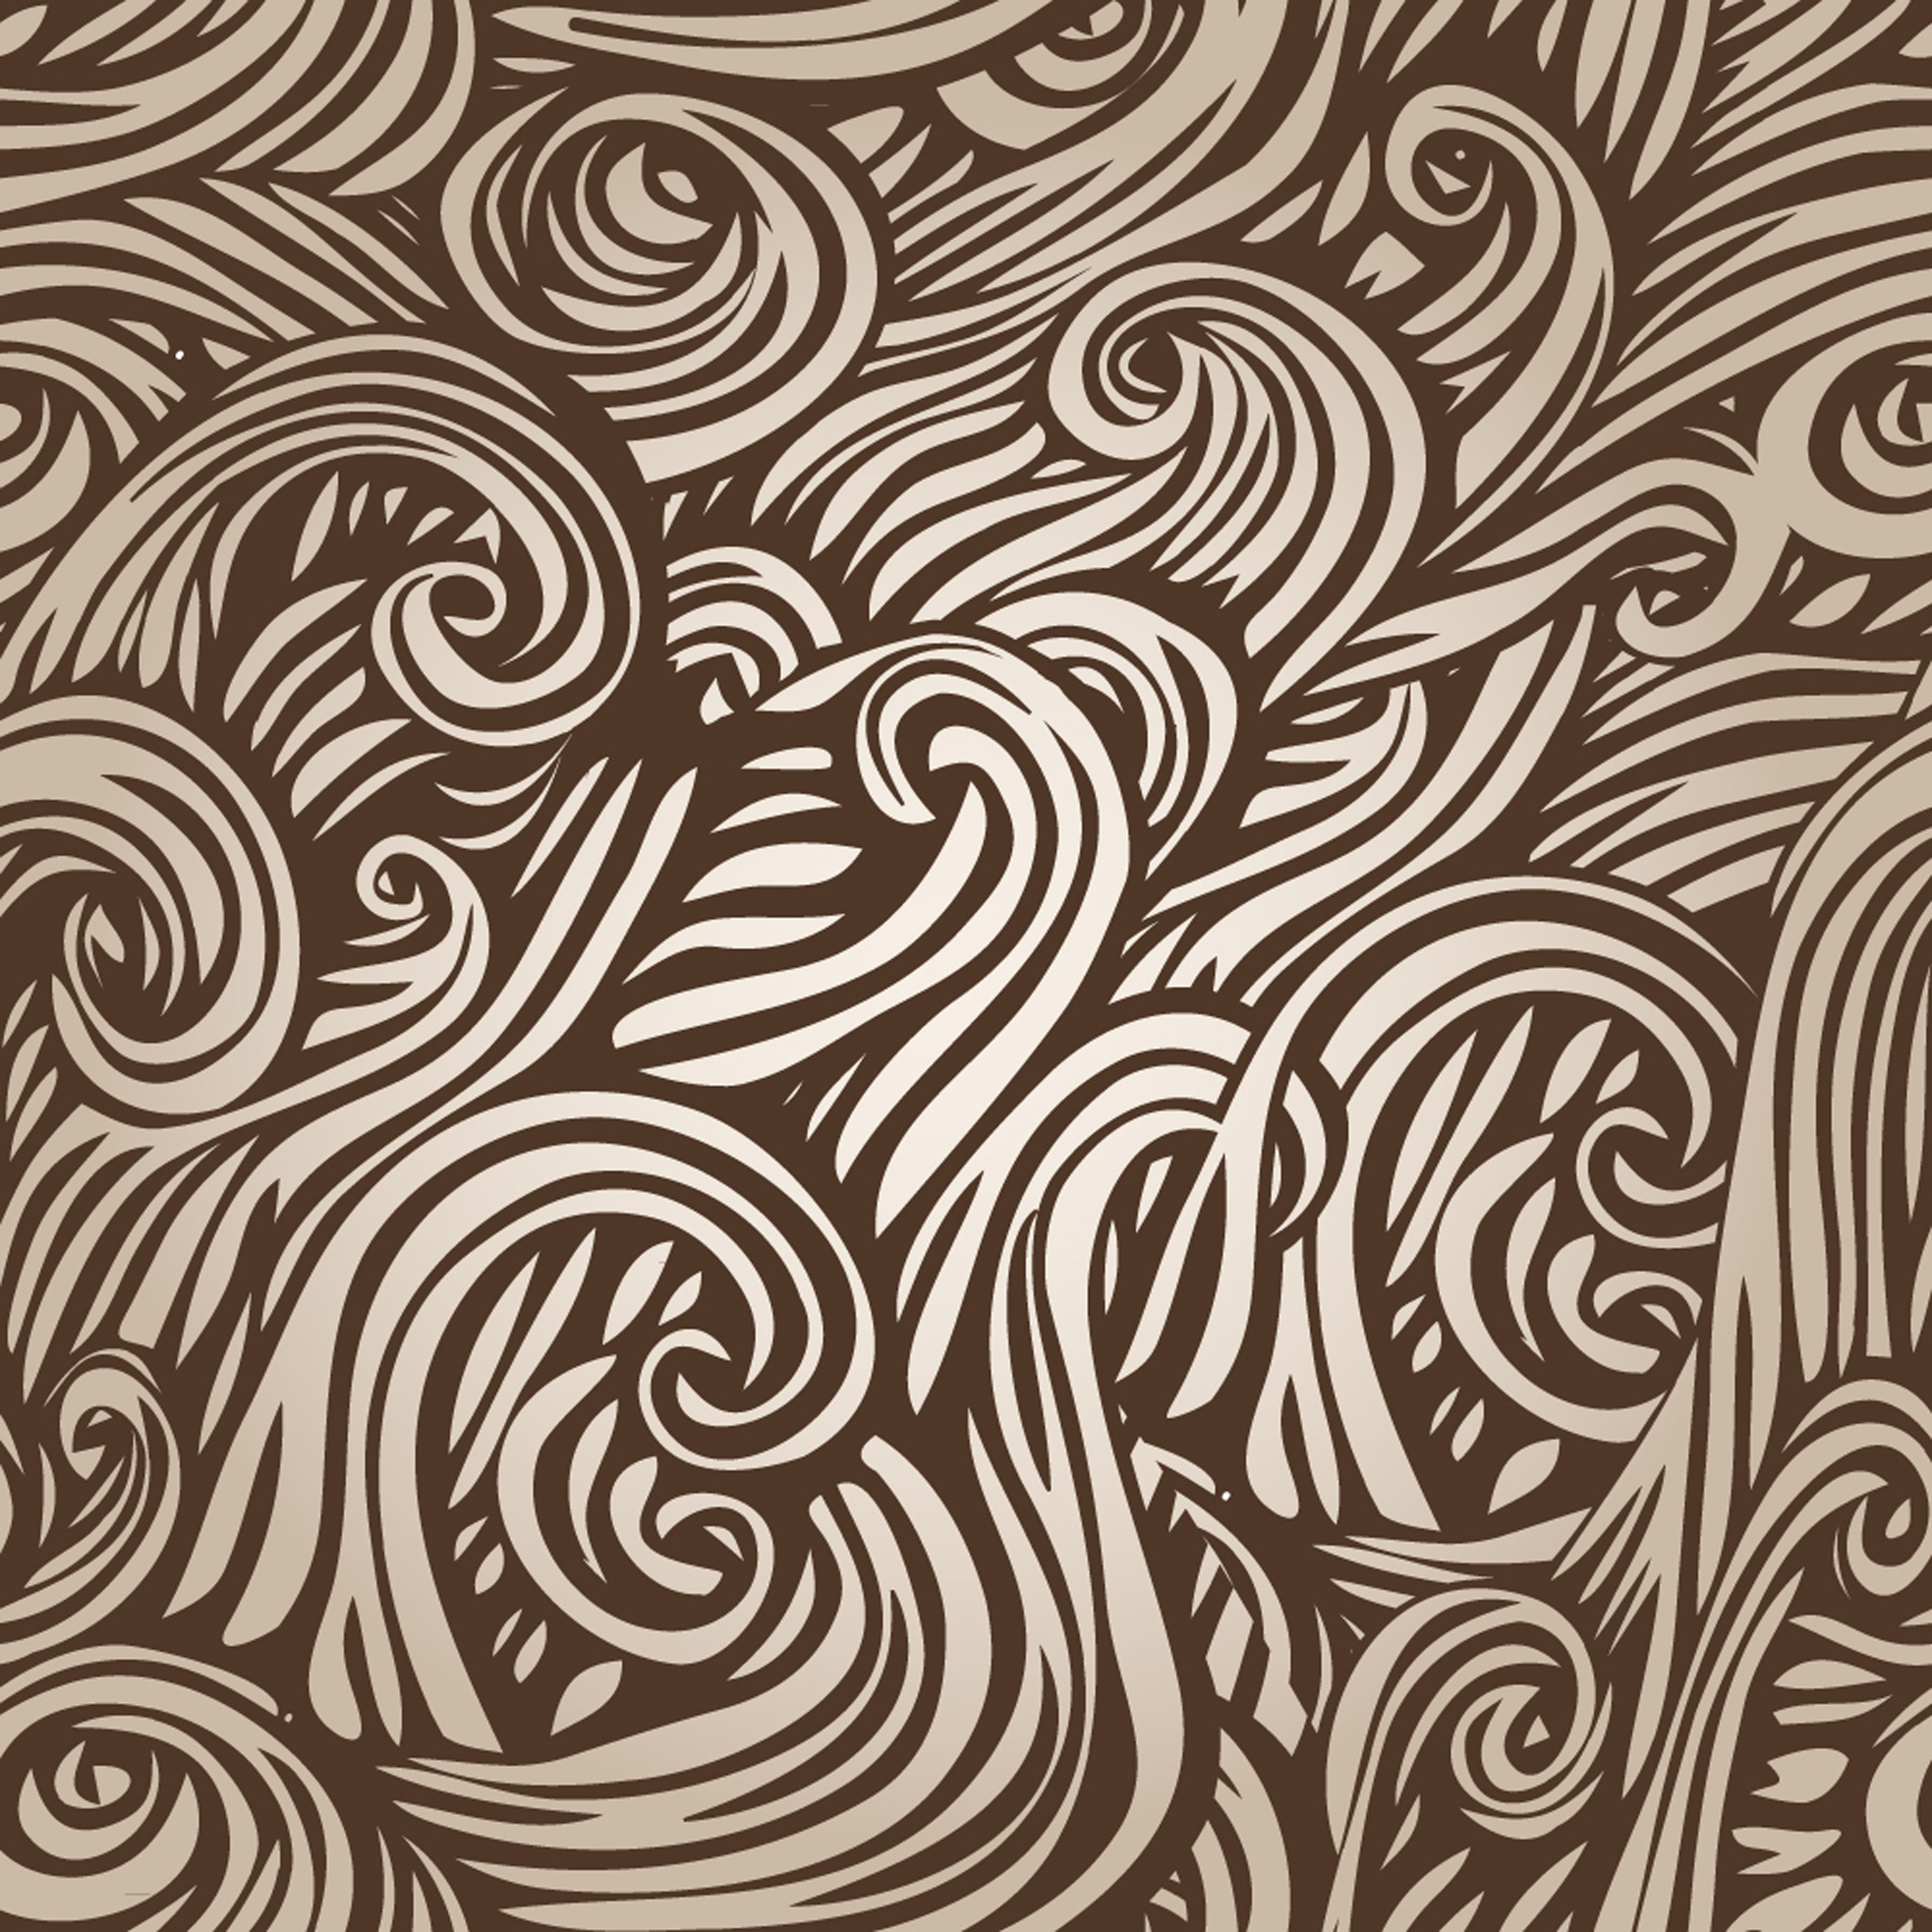 free background patterns - Ataum berglauf-verband com